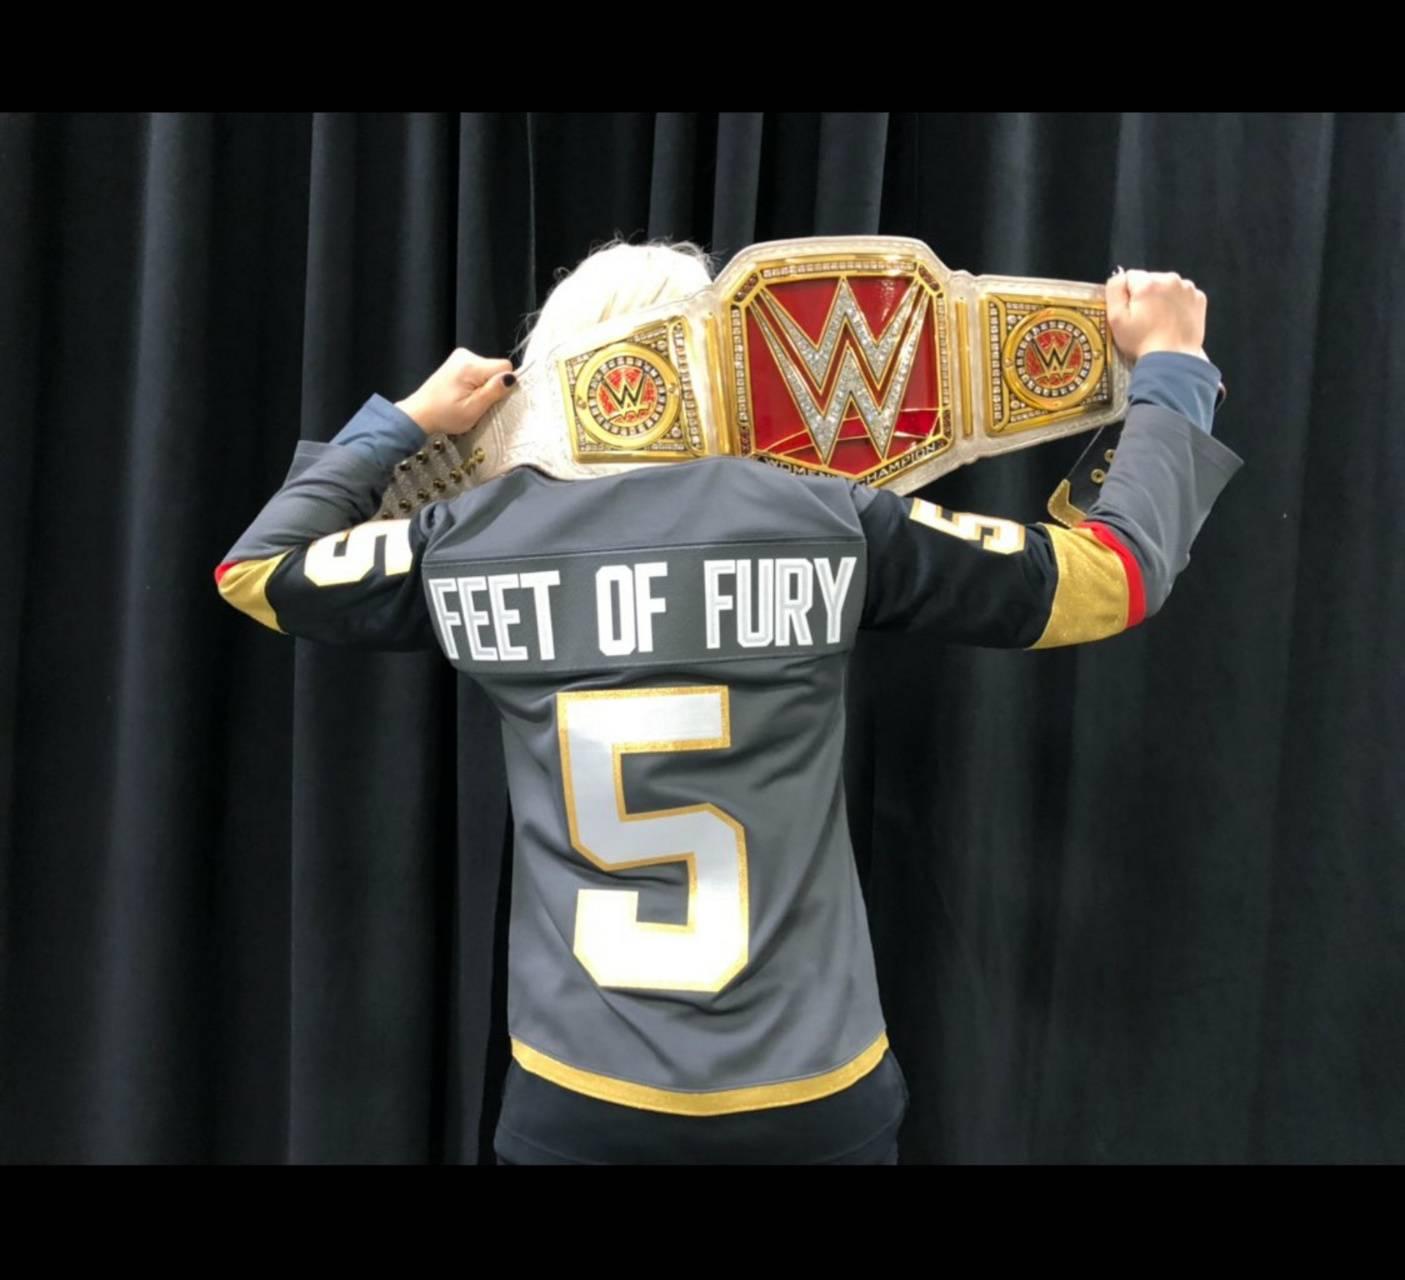 5 Feet Of Fury